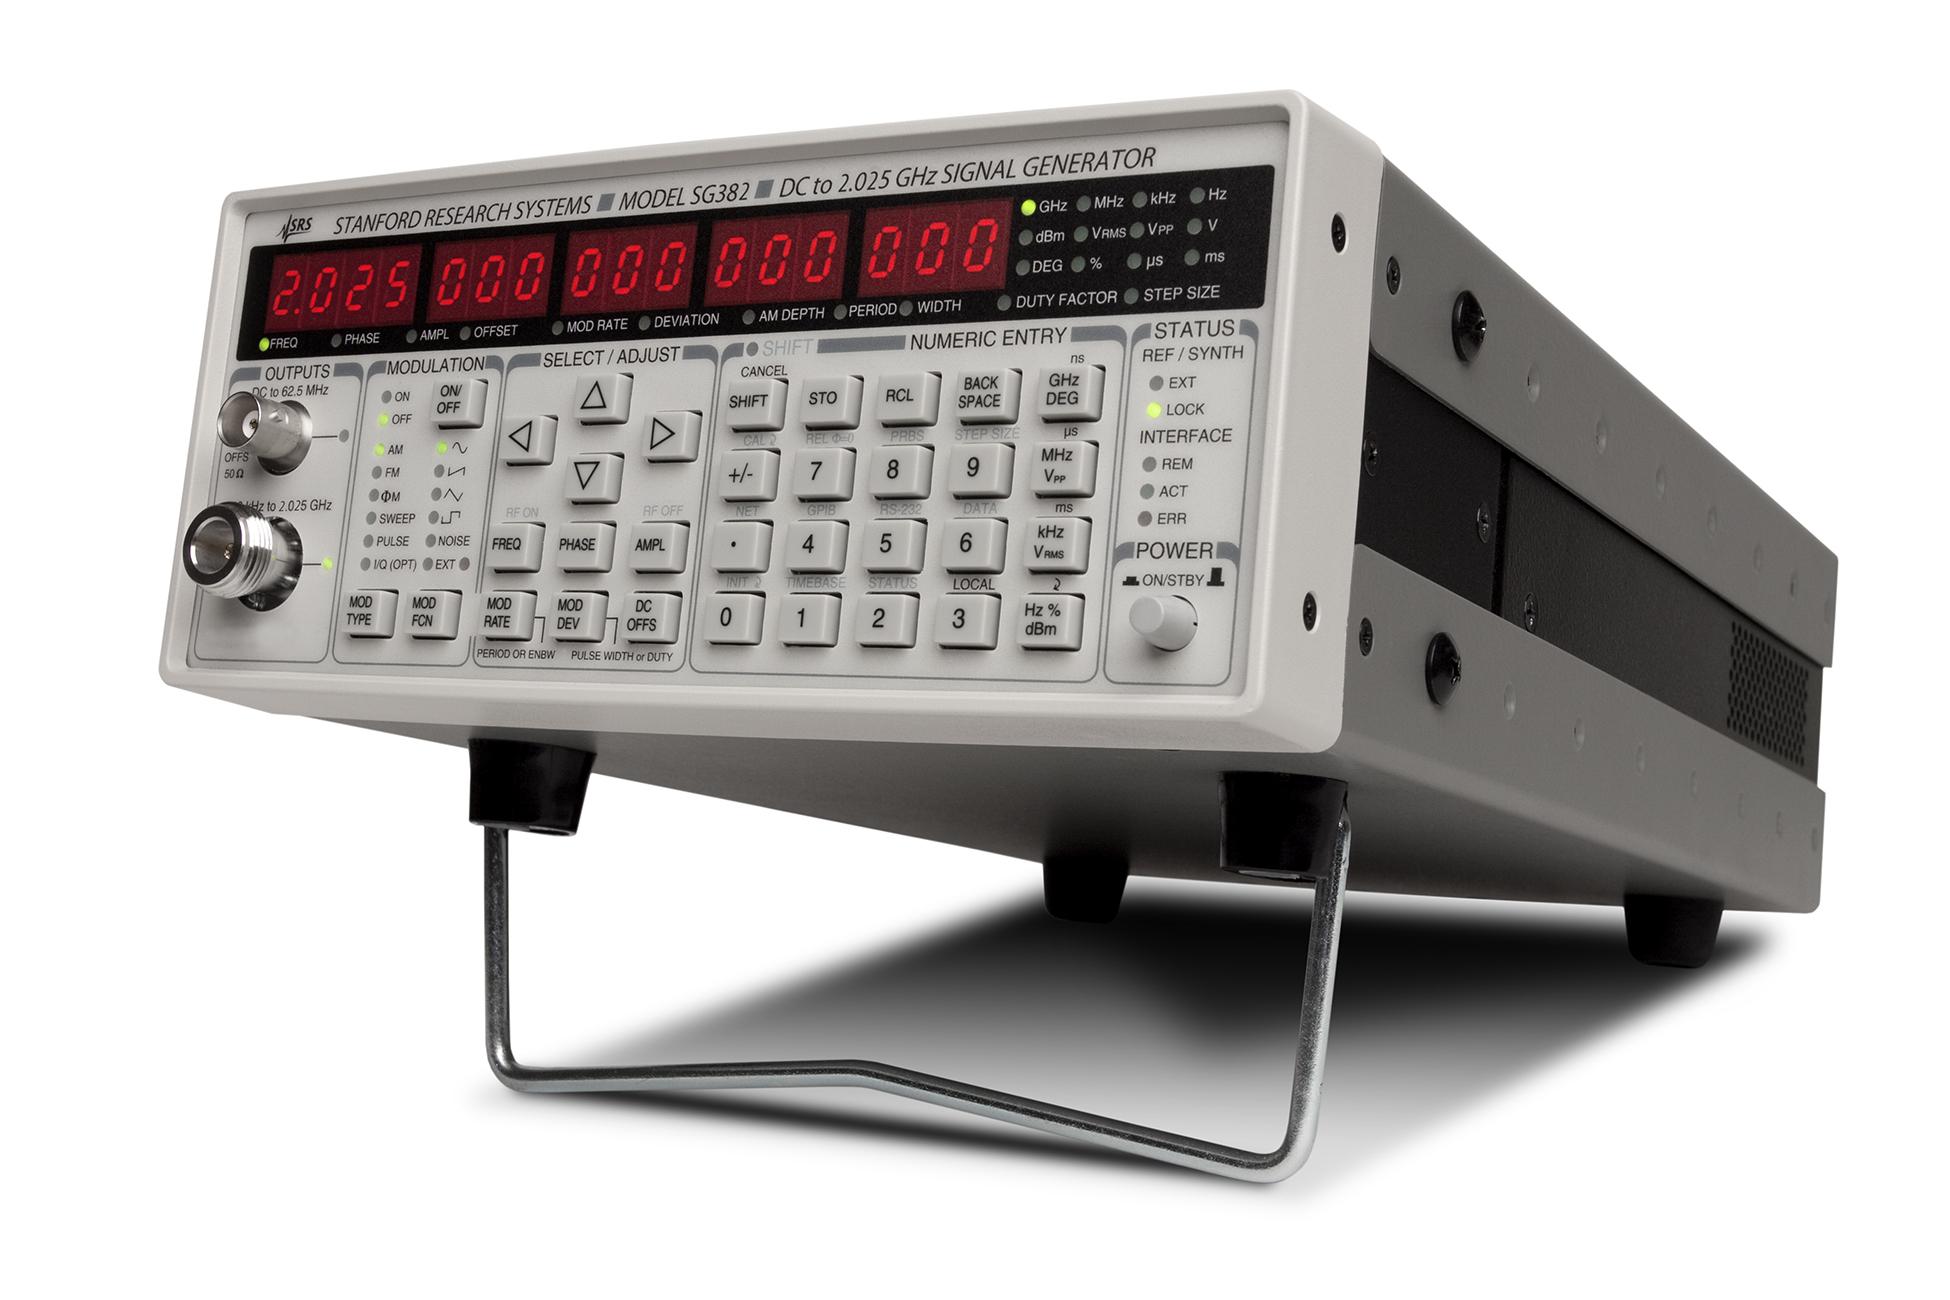 Stanford Research Systems SG382 аналоговый генератор ВЧ сигналов